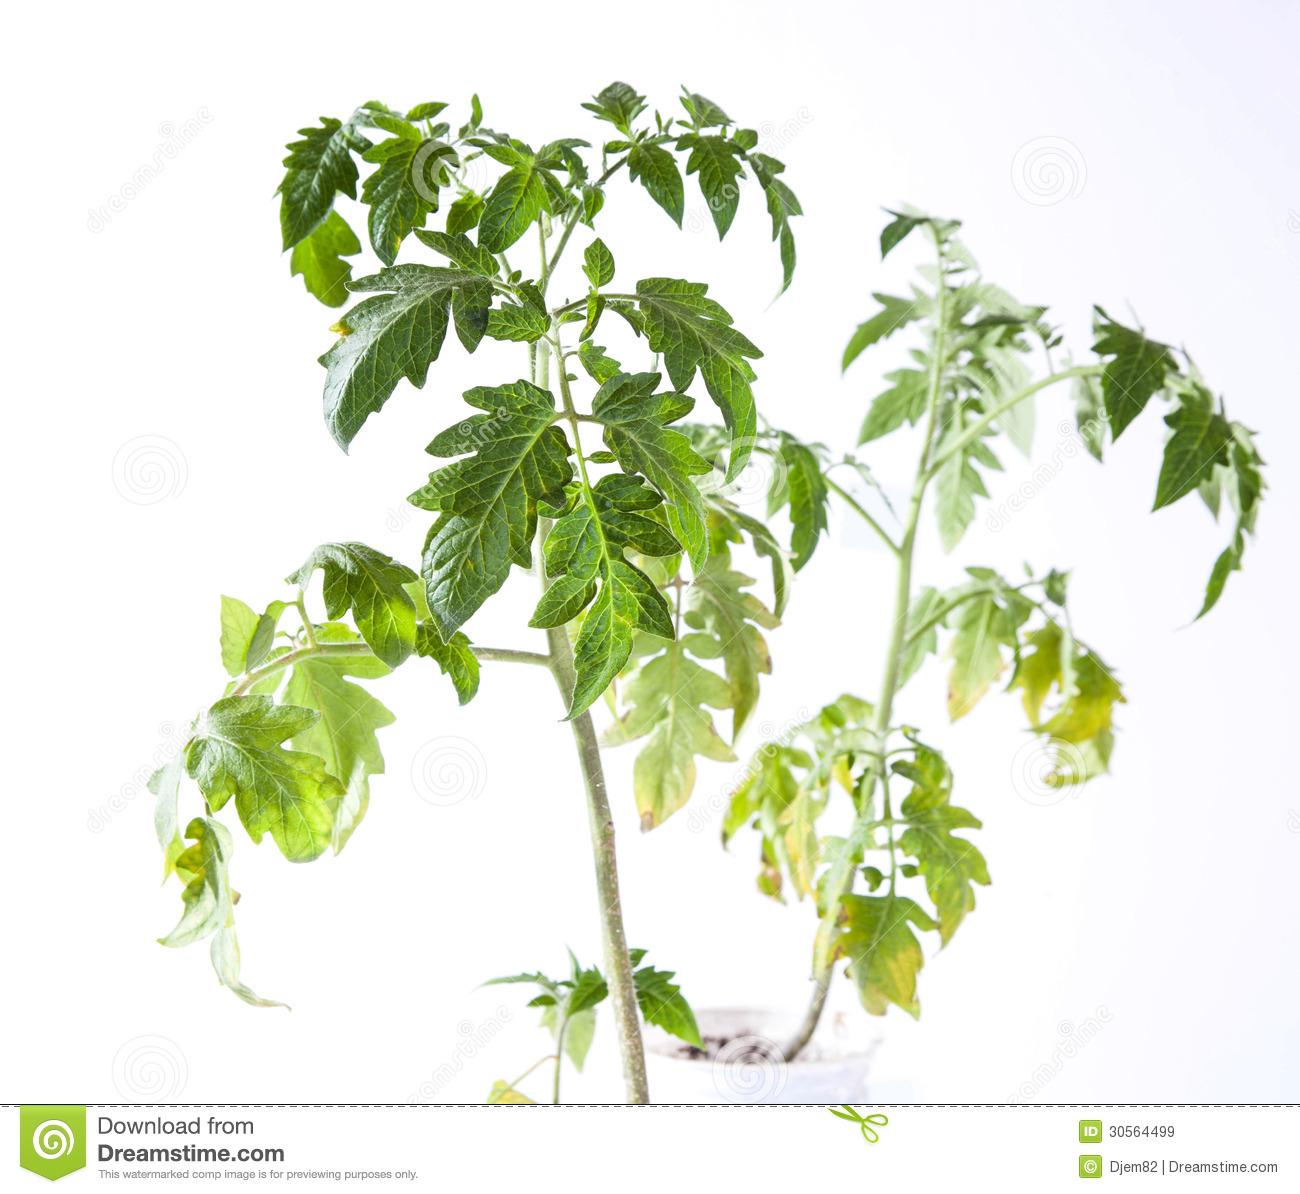 Decomposing plant clipart no background.